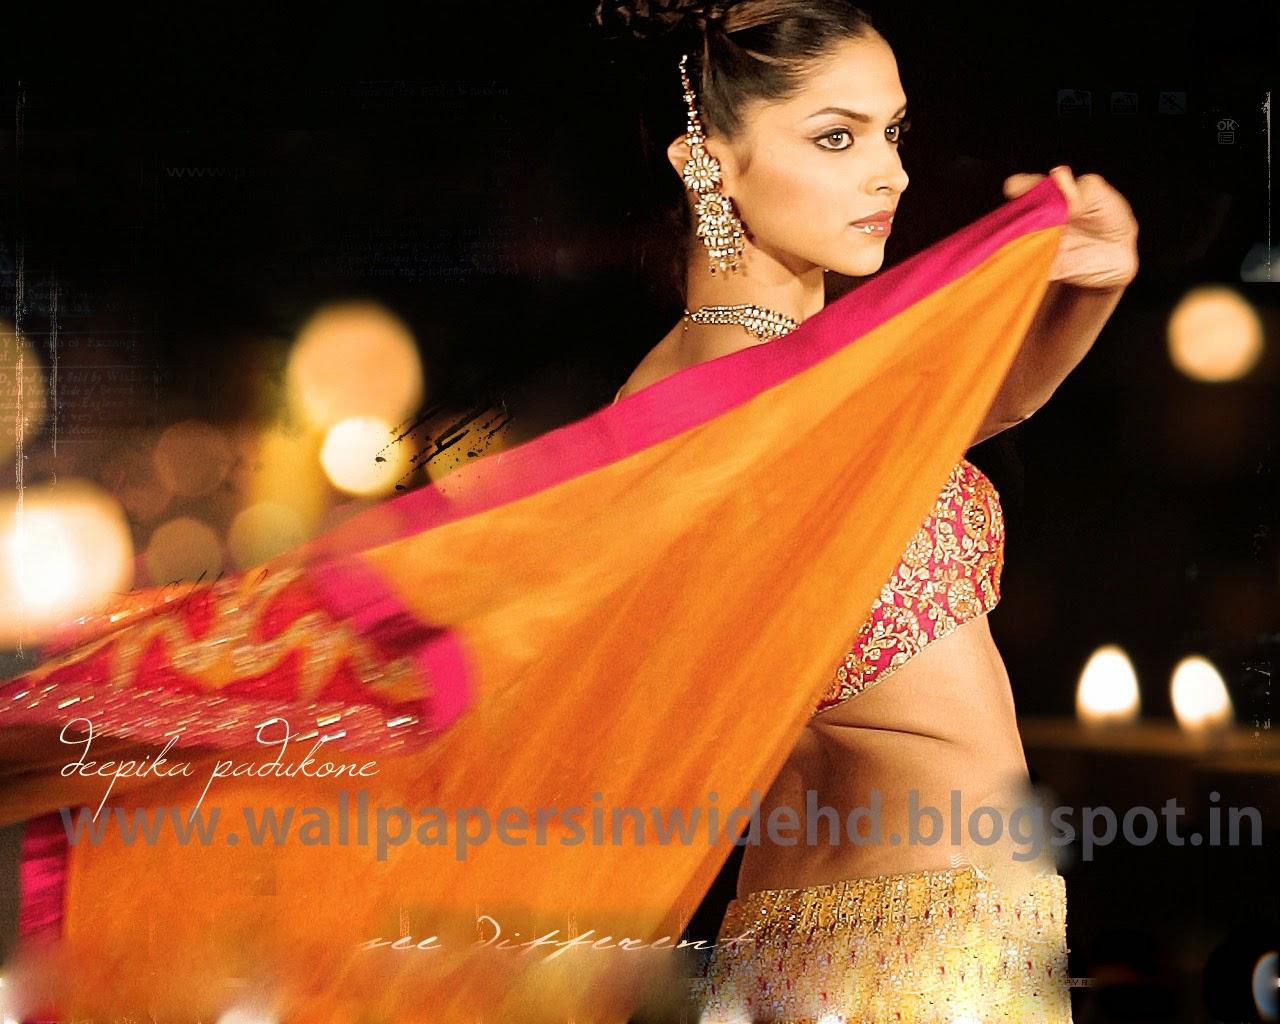 Deepika Padukone HD Wallpapers Free Download